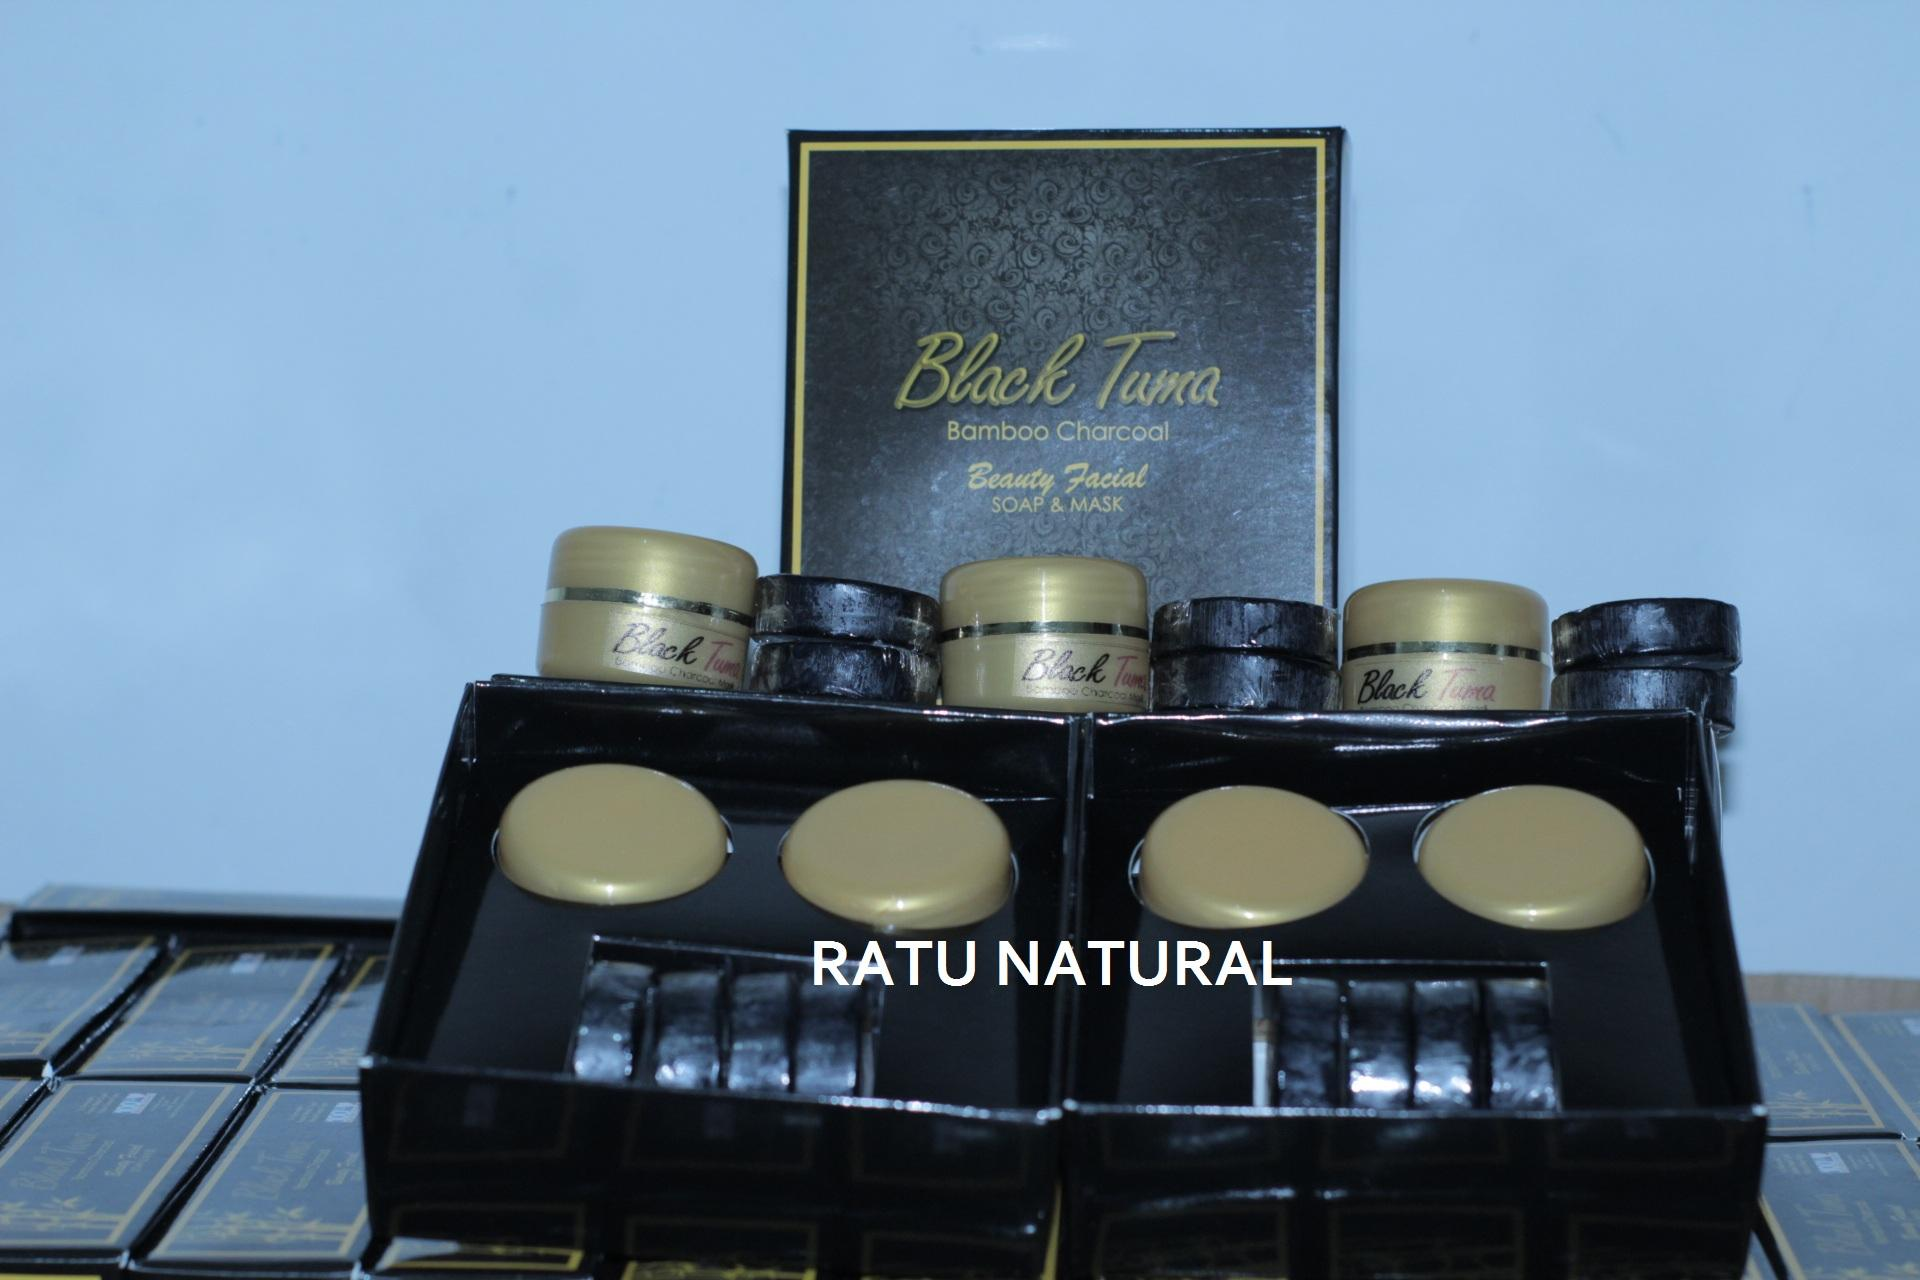 Features Blacktuma Sabun Dan Masker Charcoal Harga Terbaru Msi Bamboo Original Asli 2